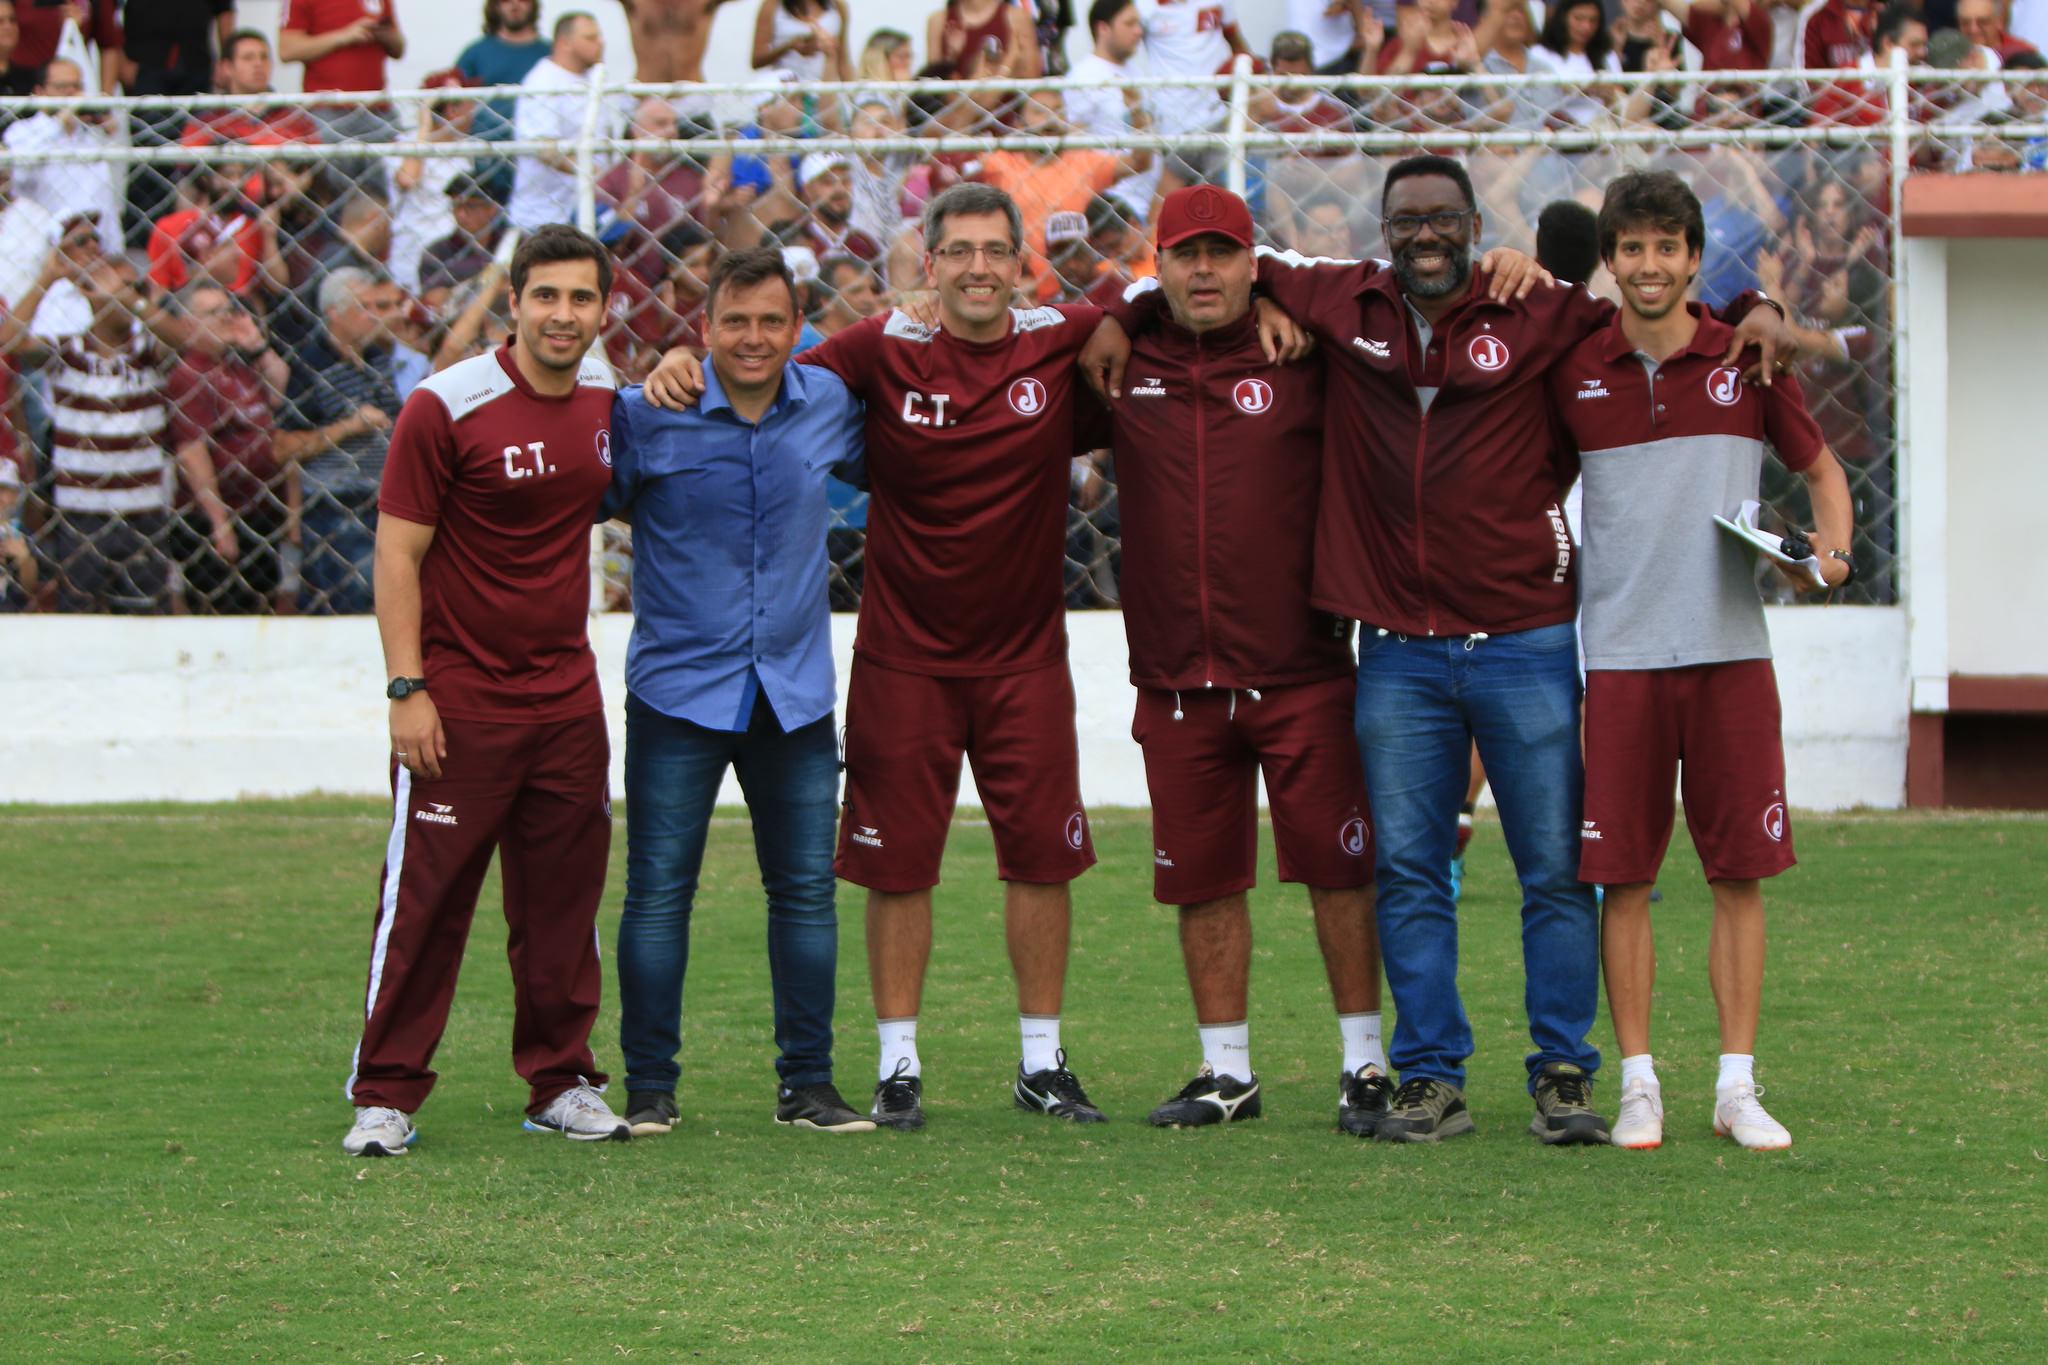 Eduardo Saraiva, Alex Alves, Marcio Leite, Marcos Romano, Vitor Faustino e Pedro Torres